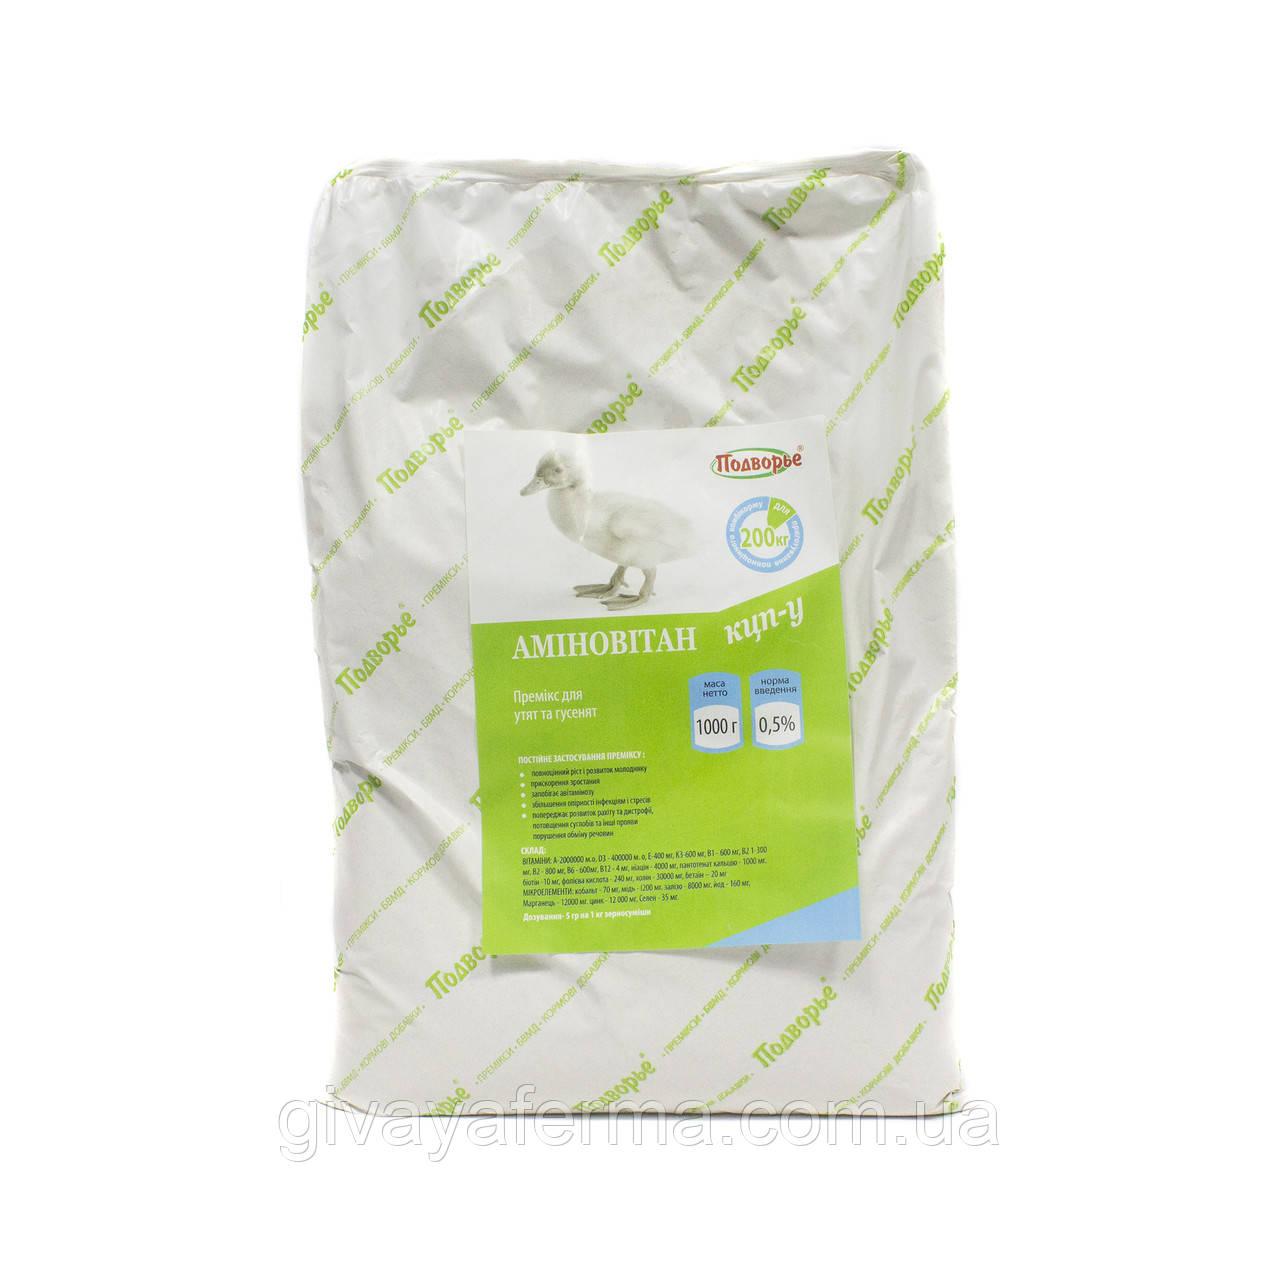 Премикс Аминовитан КЦП-У утята 0,5%, 1 кг, витаминно-минеральная добавка